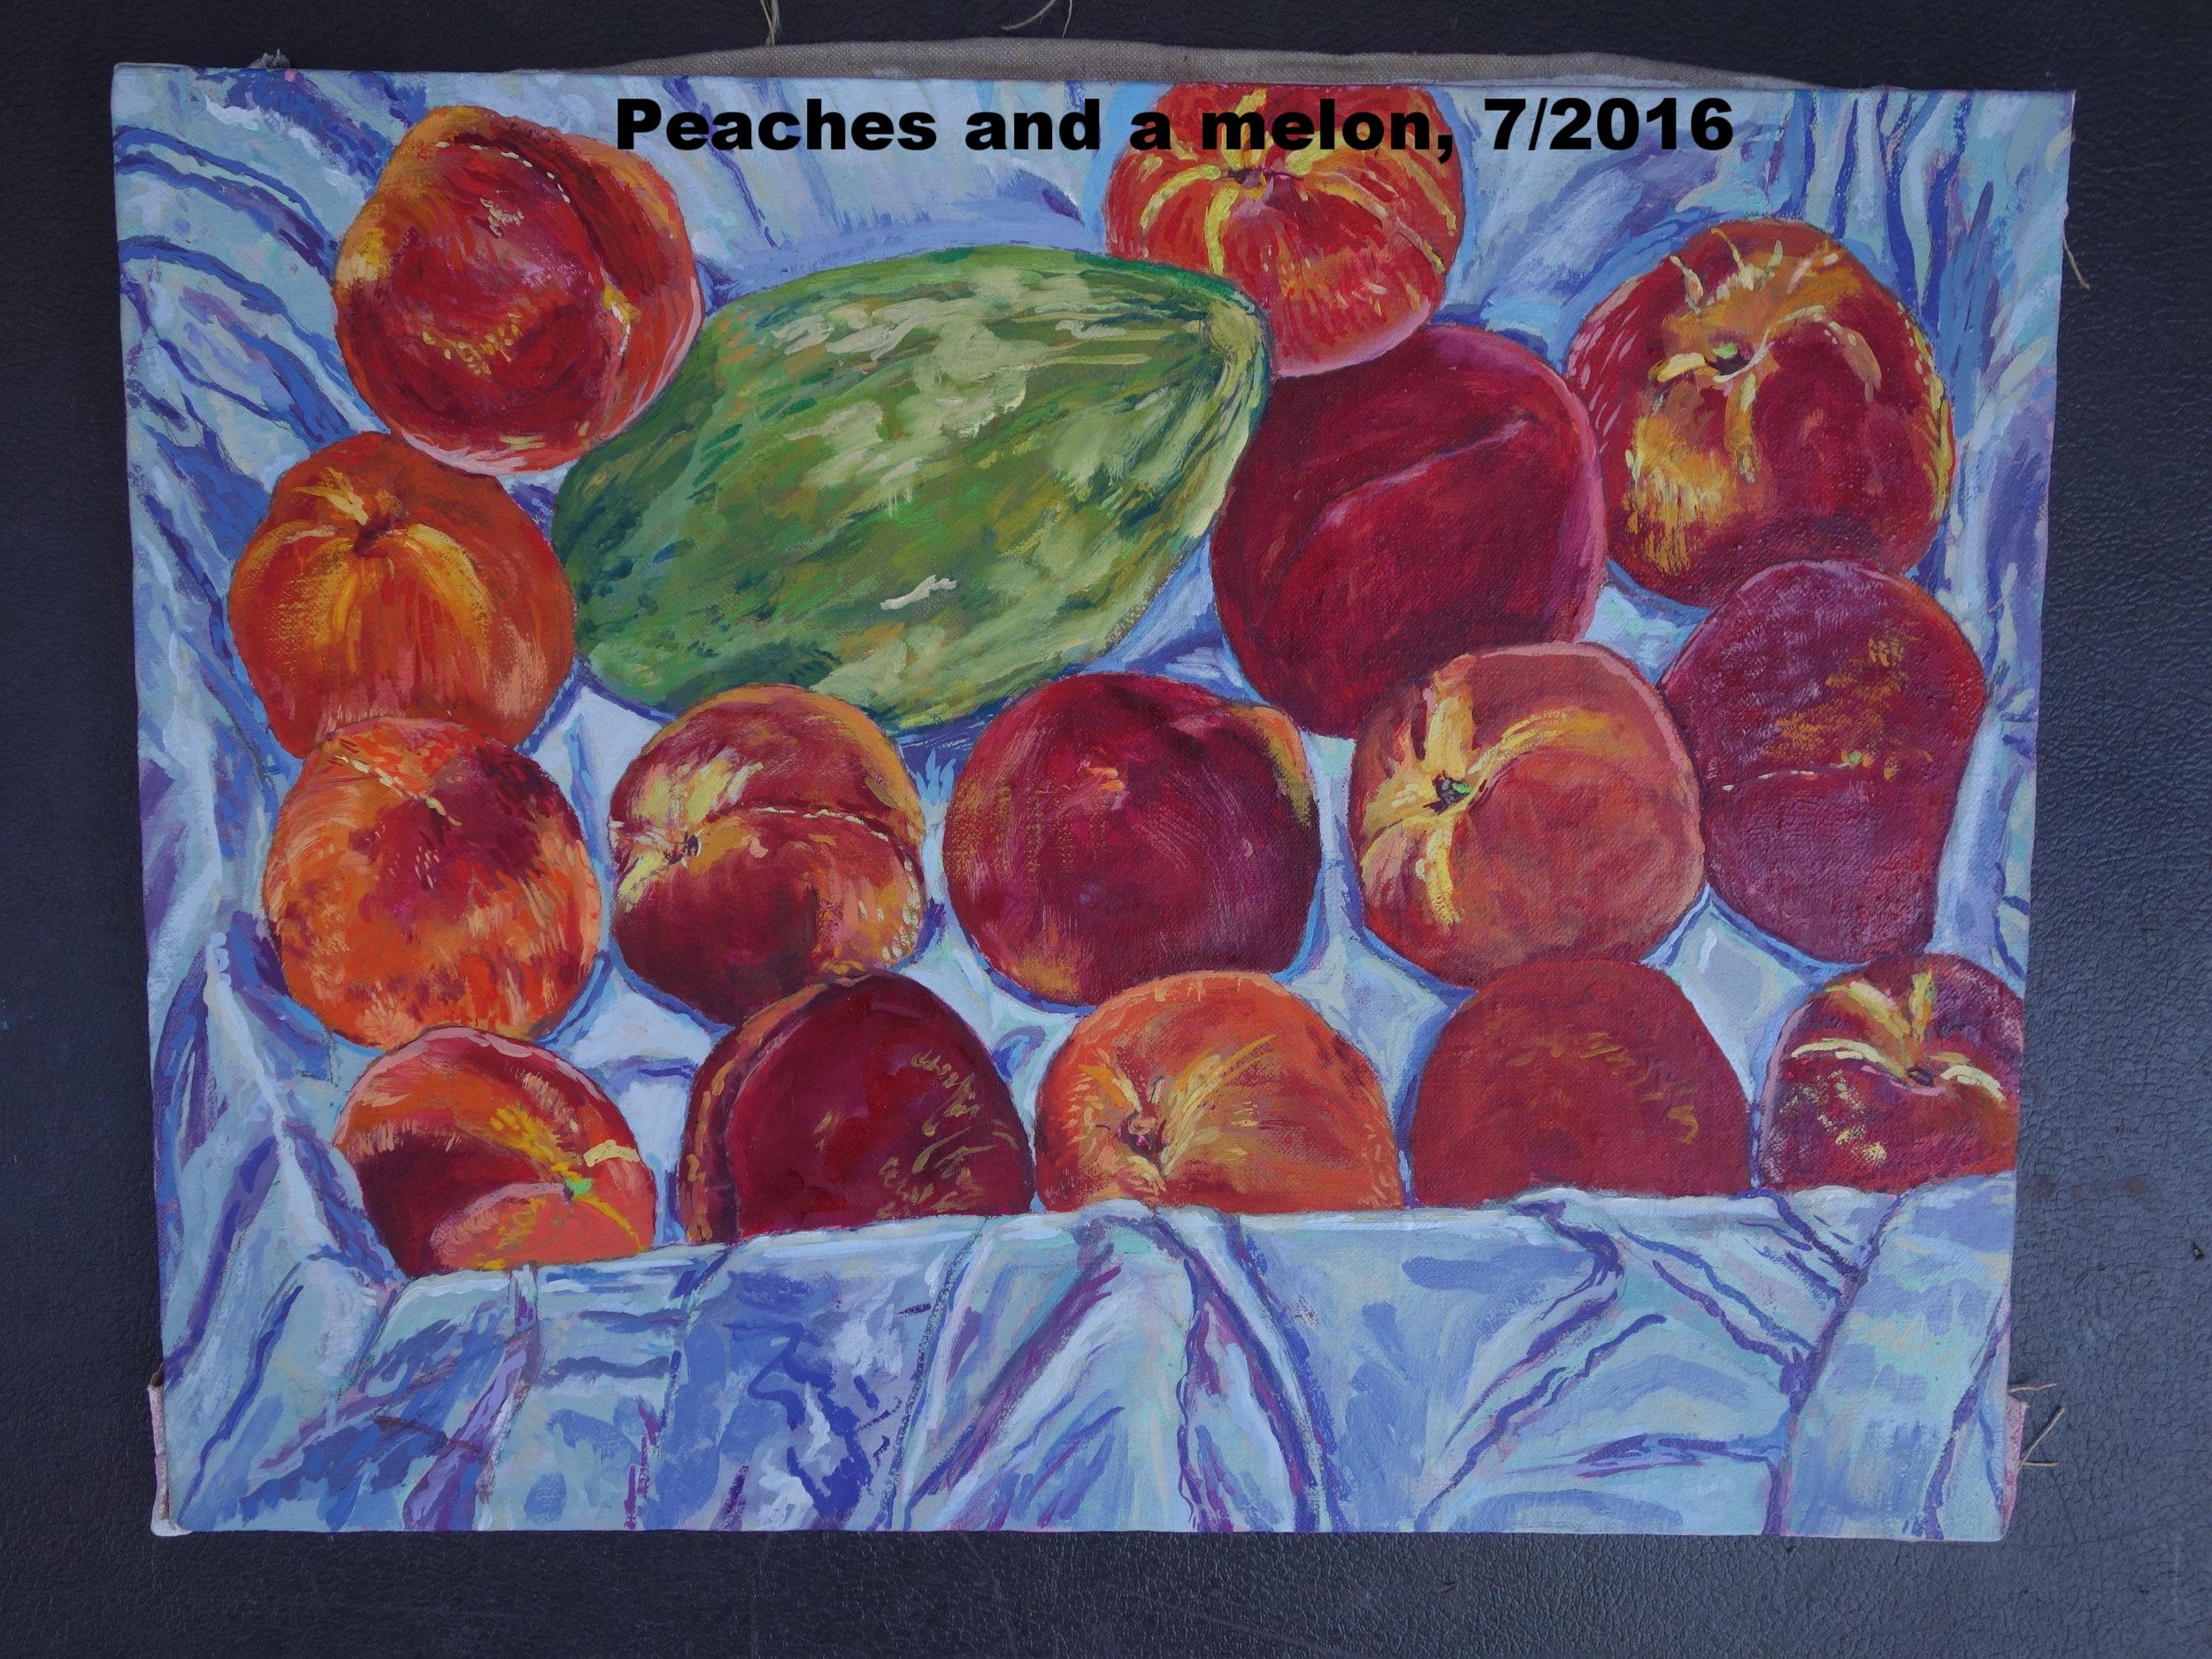 peaches_in_boxDSC00003.JPG